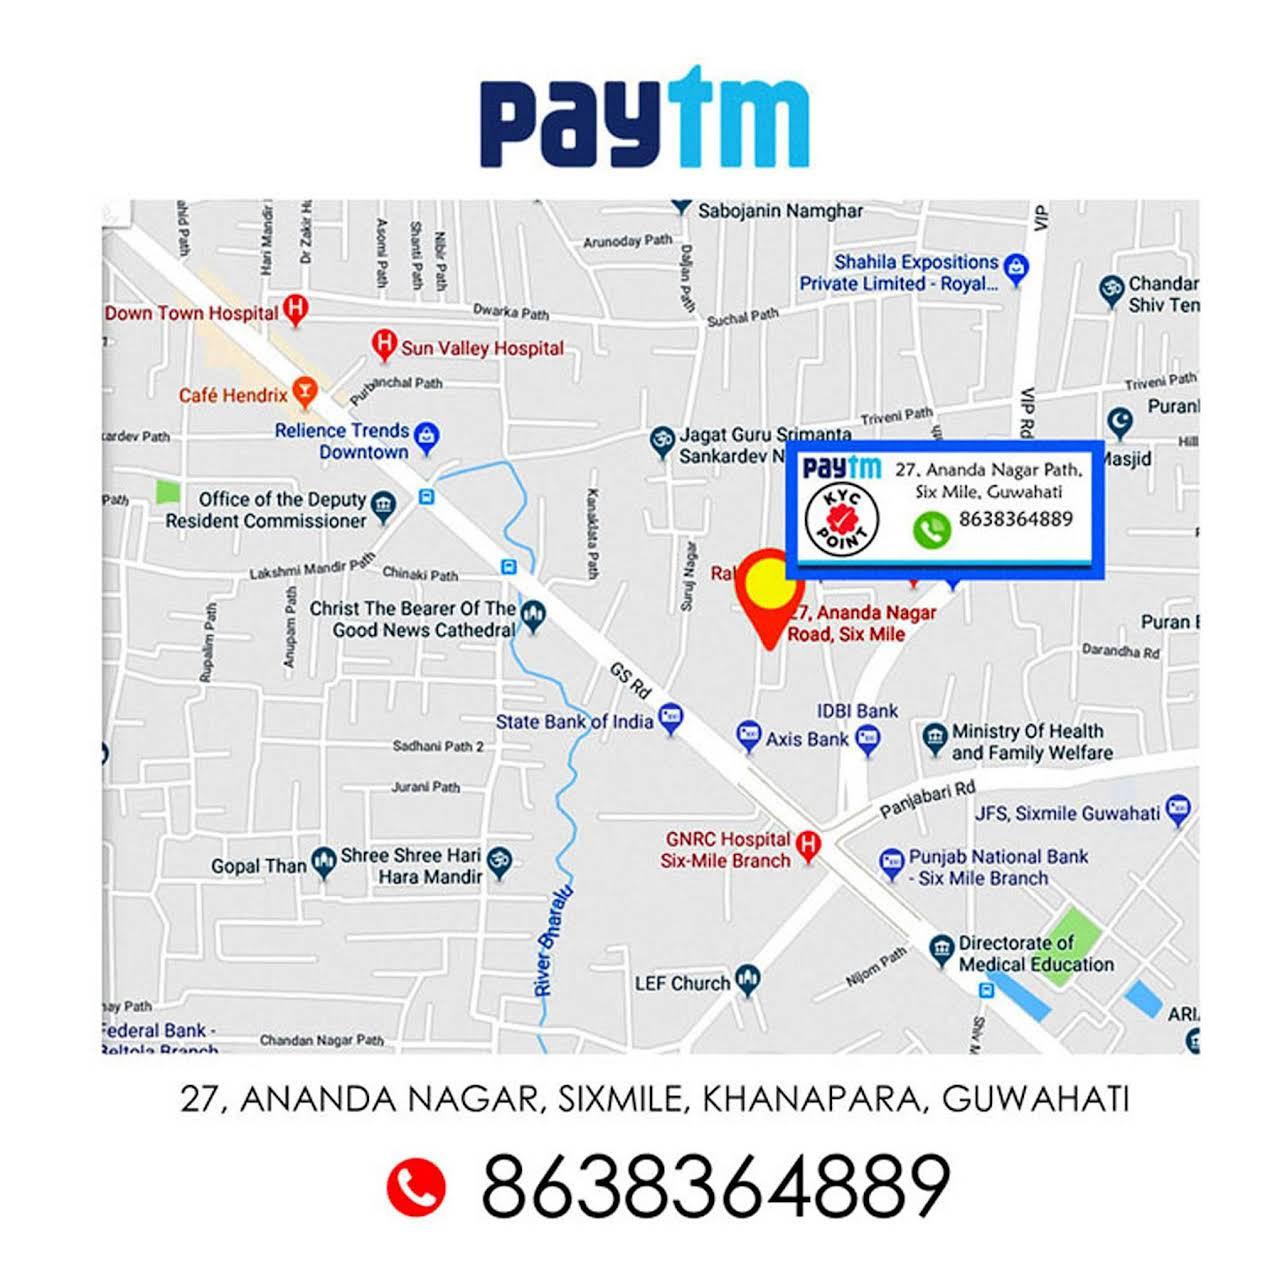 Paytm KYC Point Guwahati - Business Center in Six Mile, Guwahati